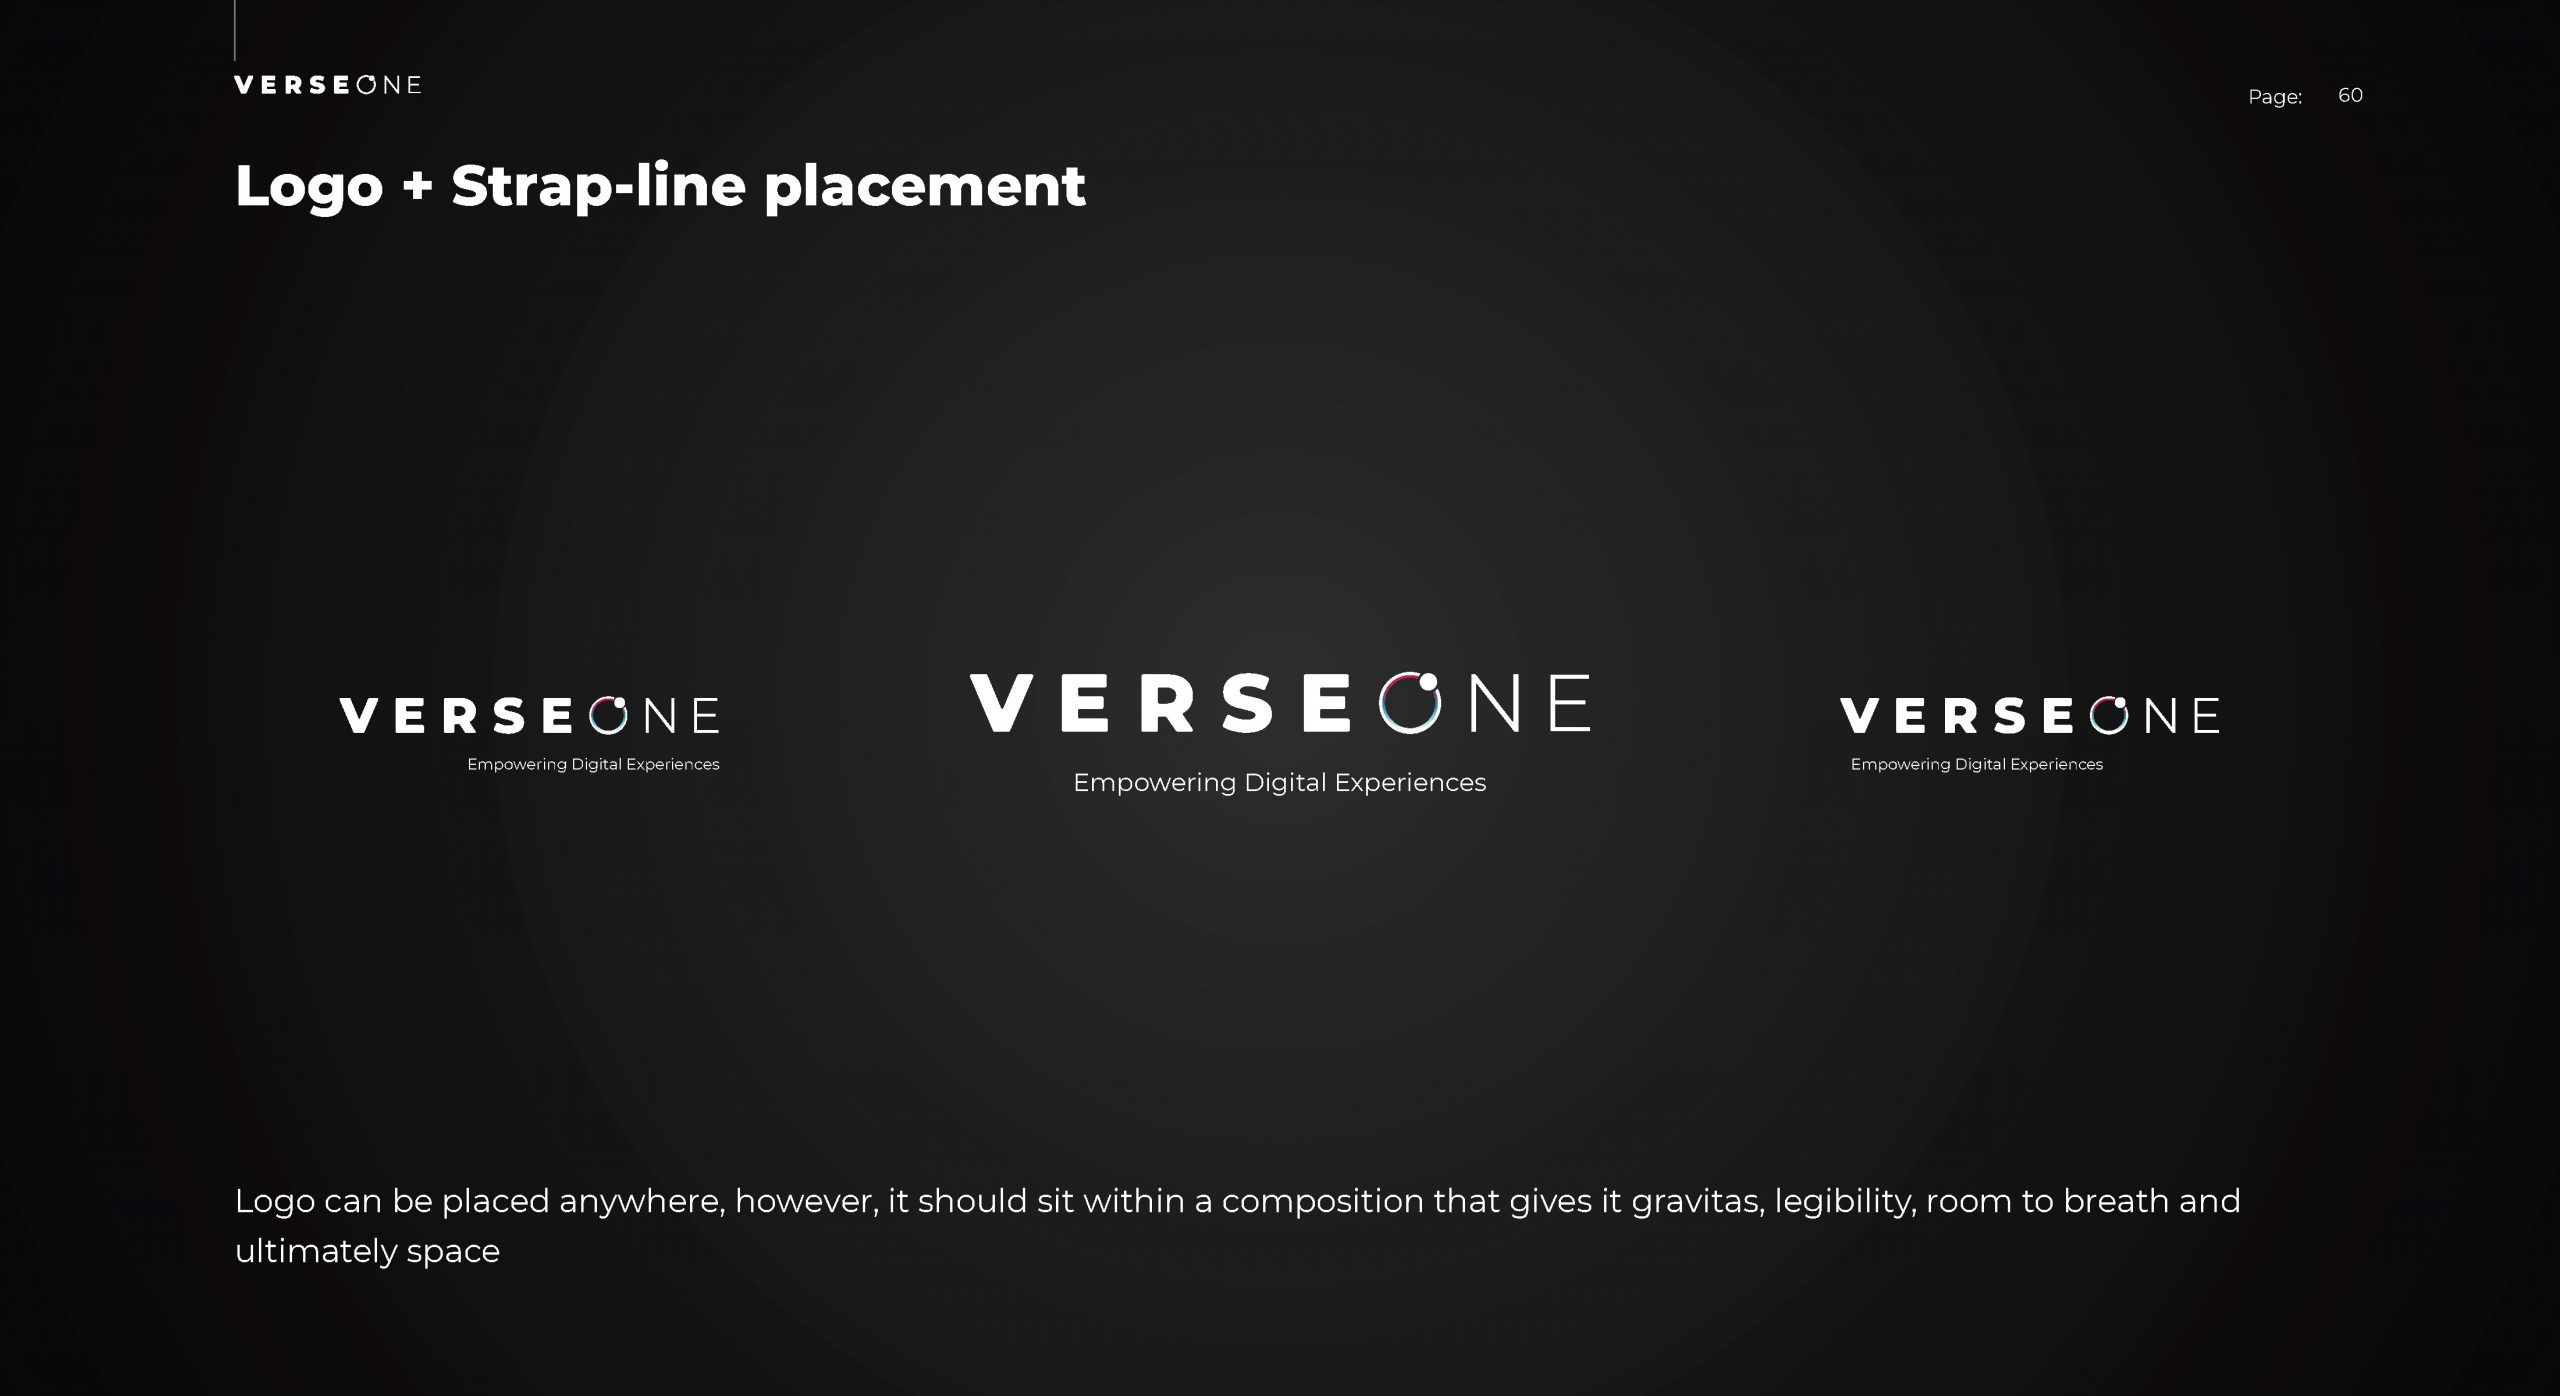 VerseOne_BrandBook_VerseOne.BrandBook.V3small_Page_060